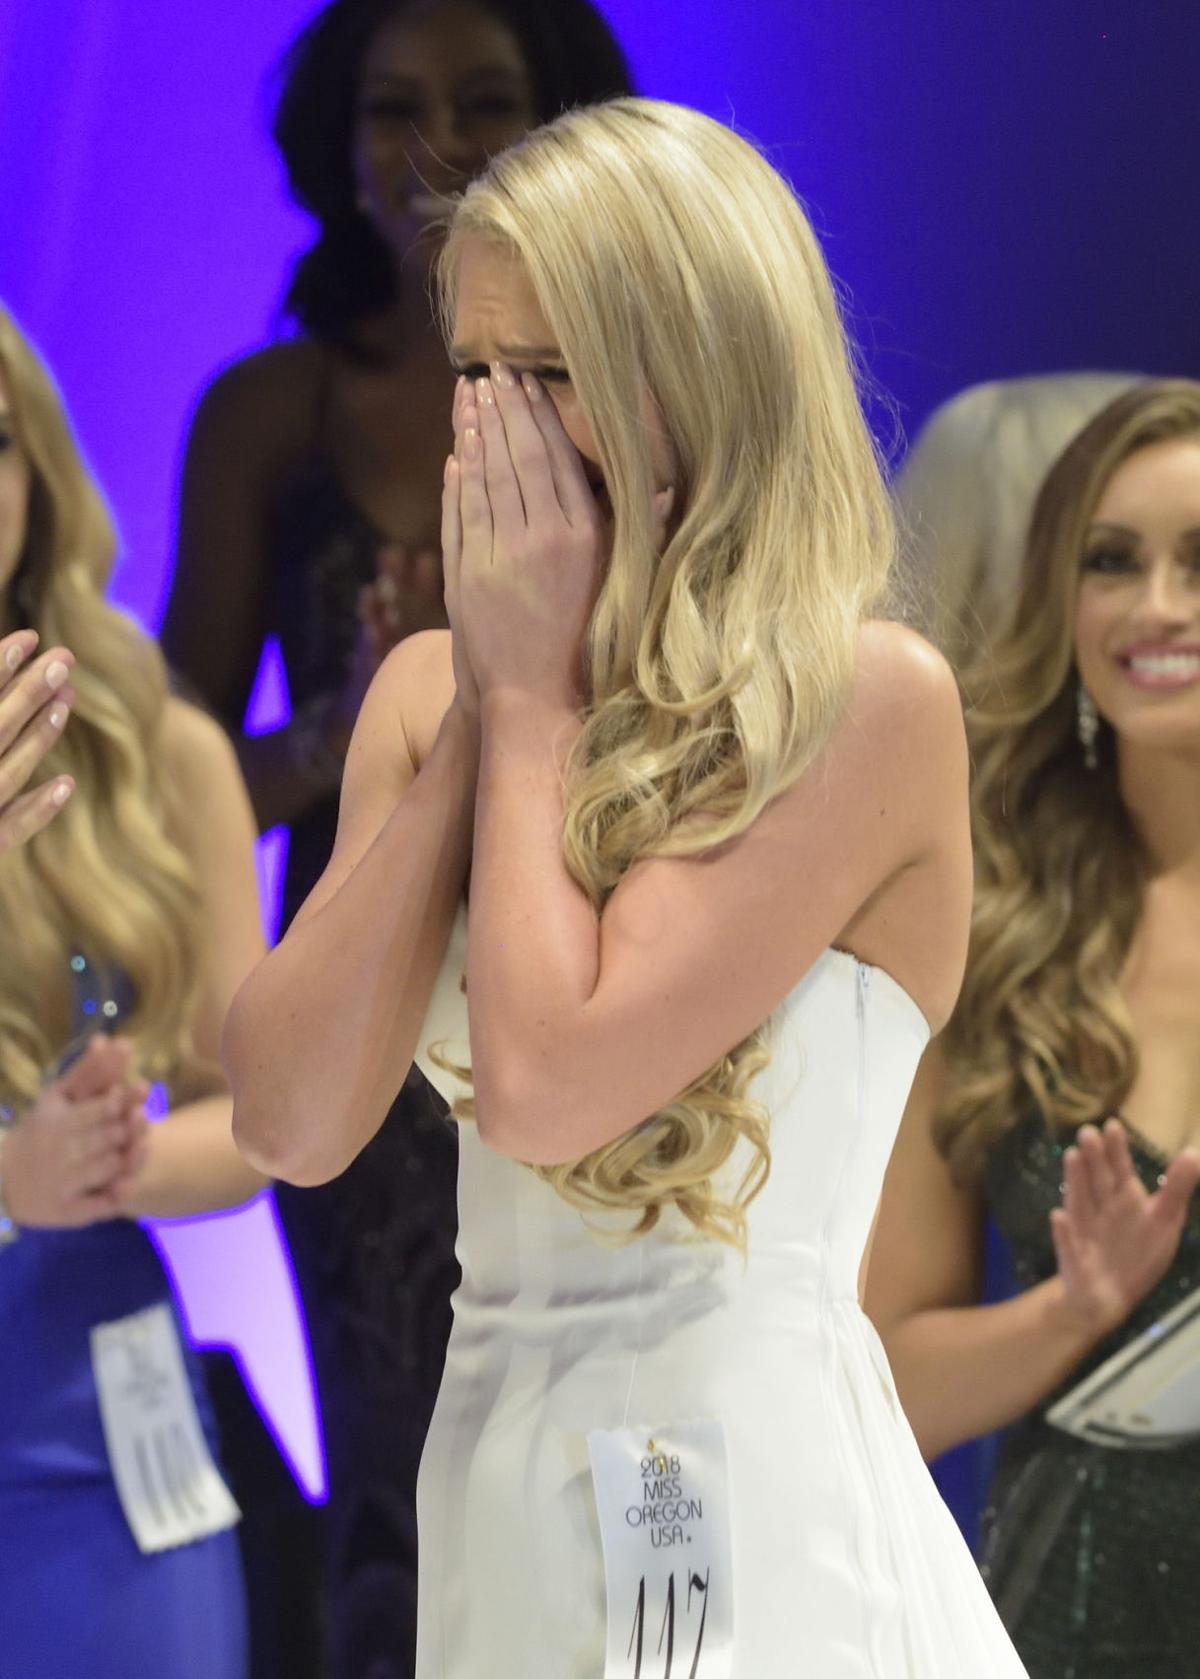 Miss Oregon USA 2018 Toneata Morgan